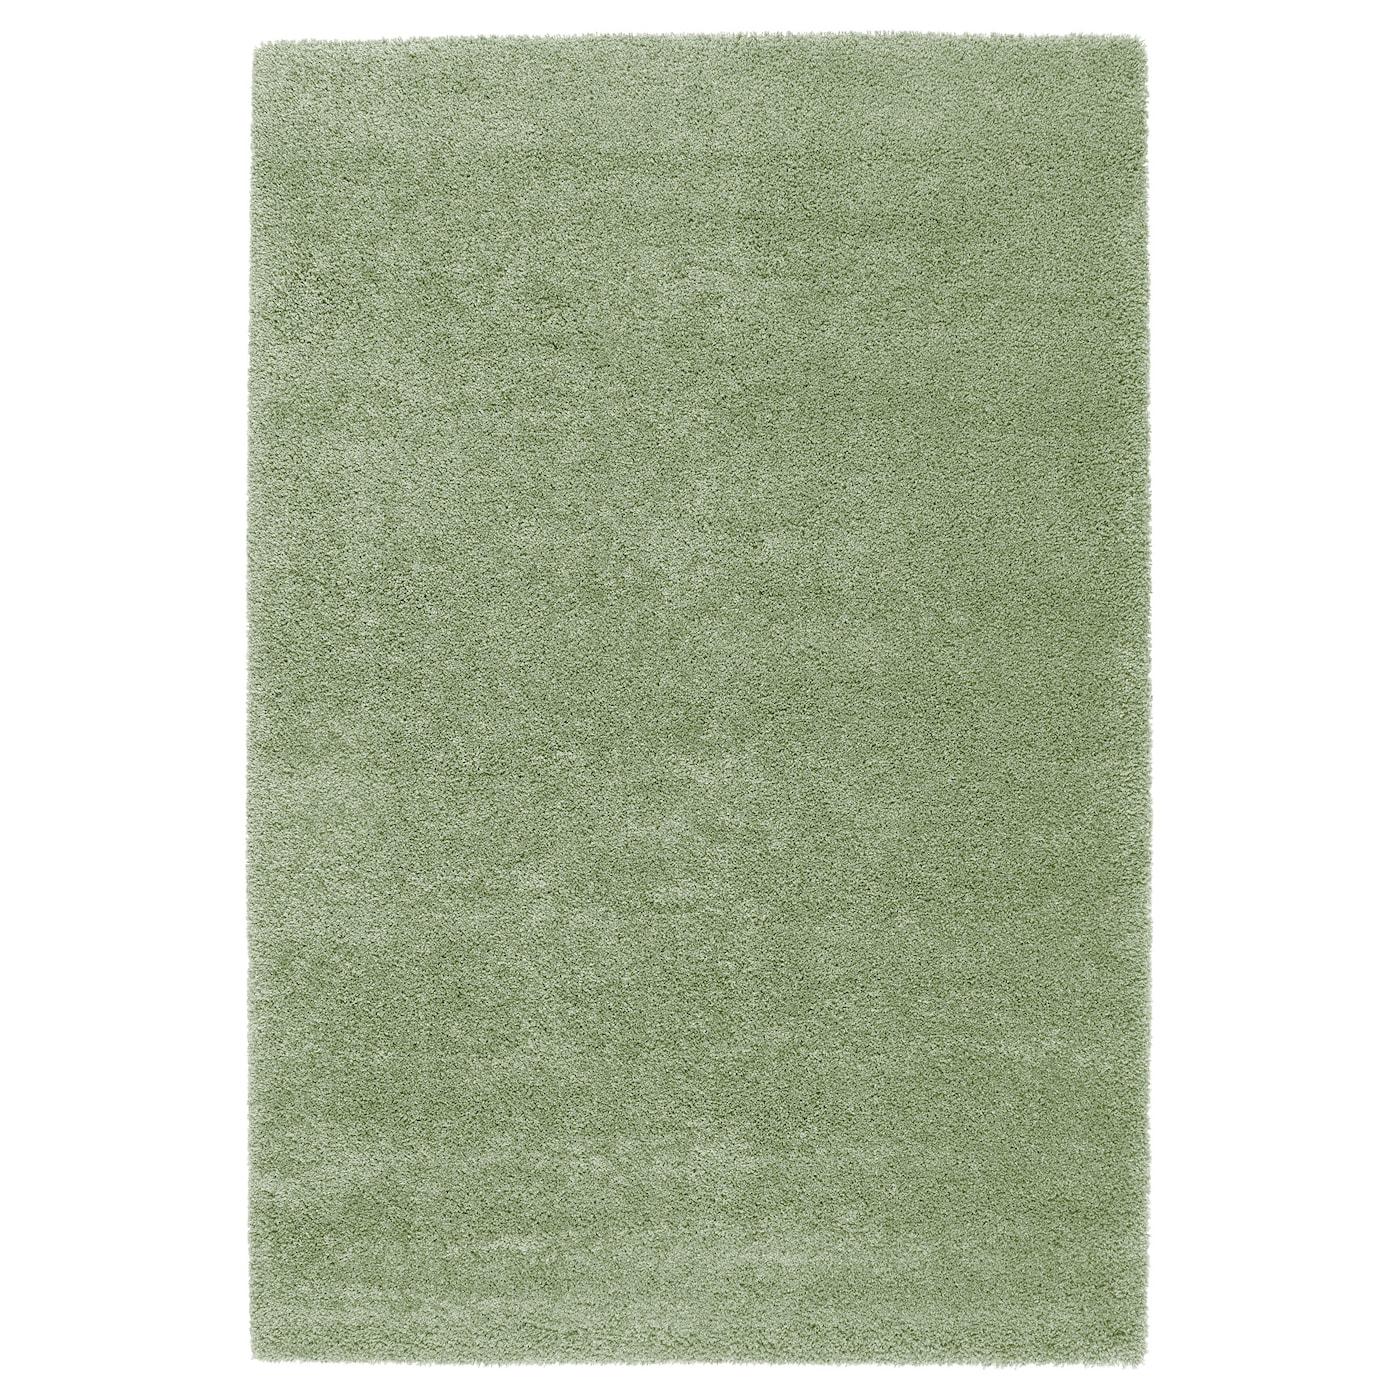 dum tapis poils hauts vert clair 133x195 cm ikea. Black Bedroom Furniture Sets. Home Design Ideas